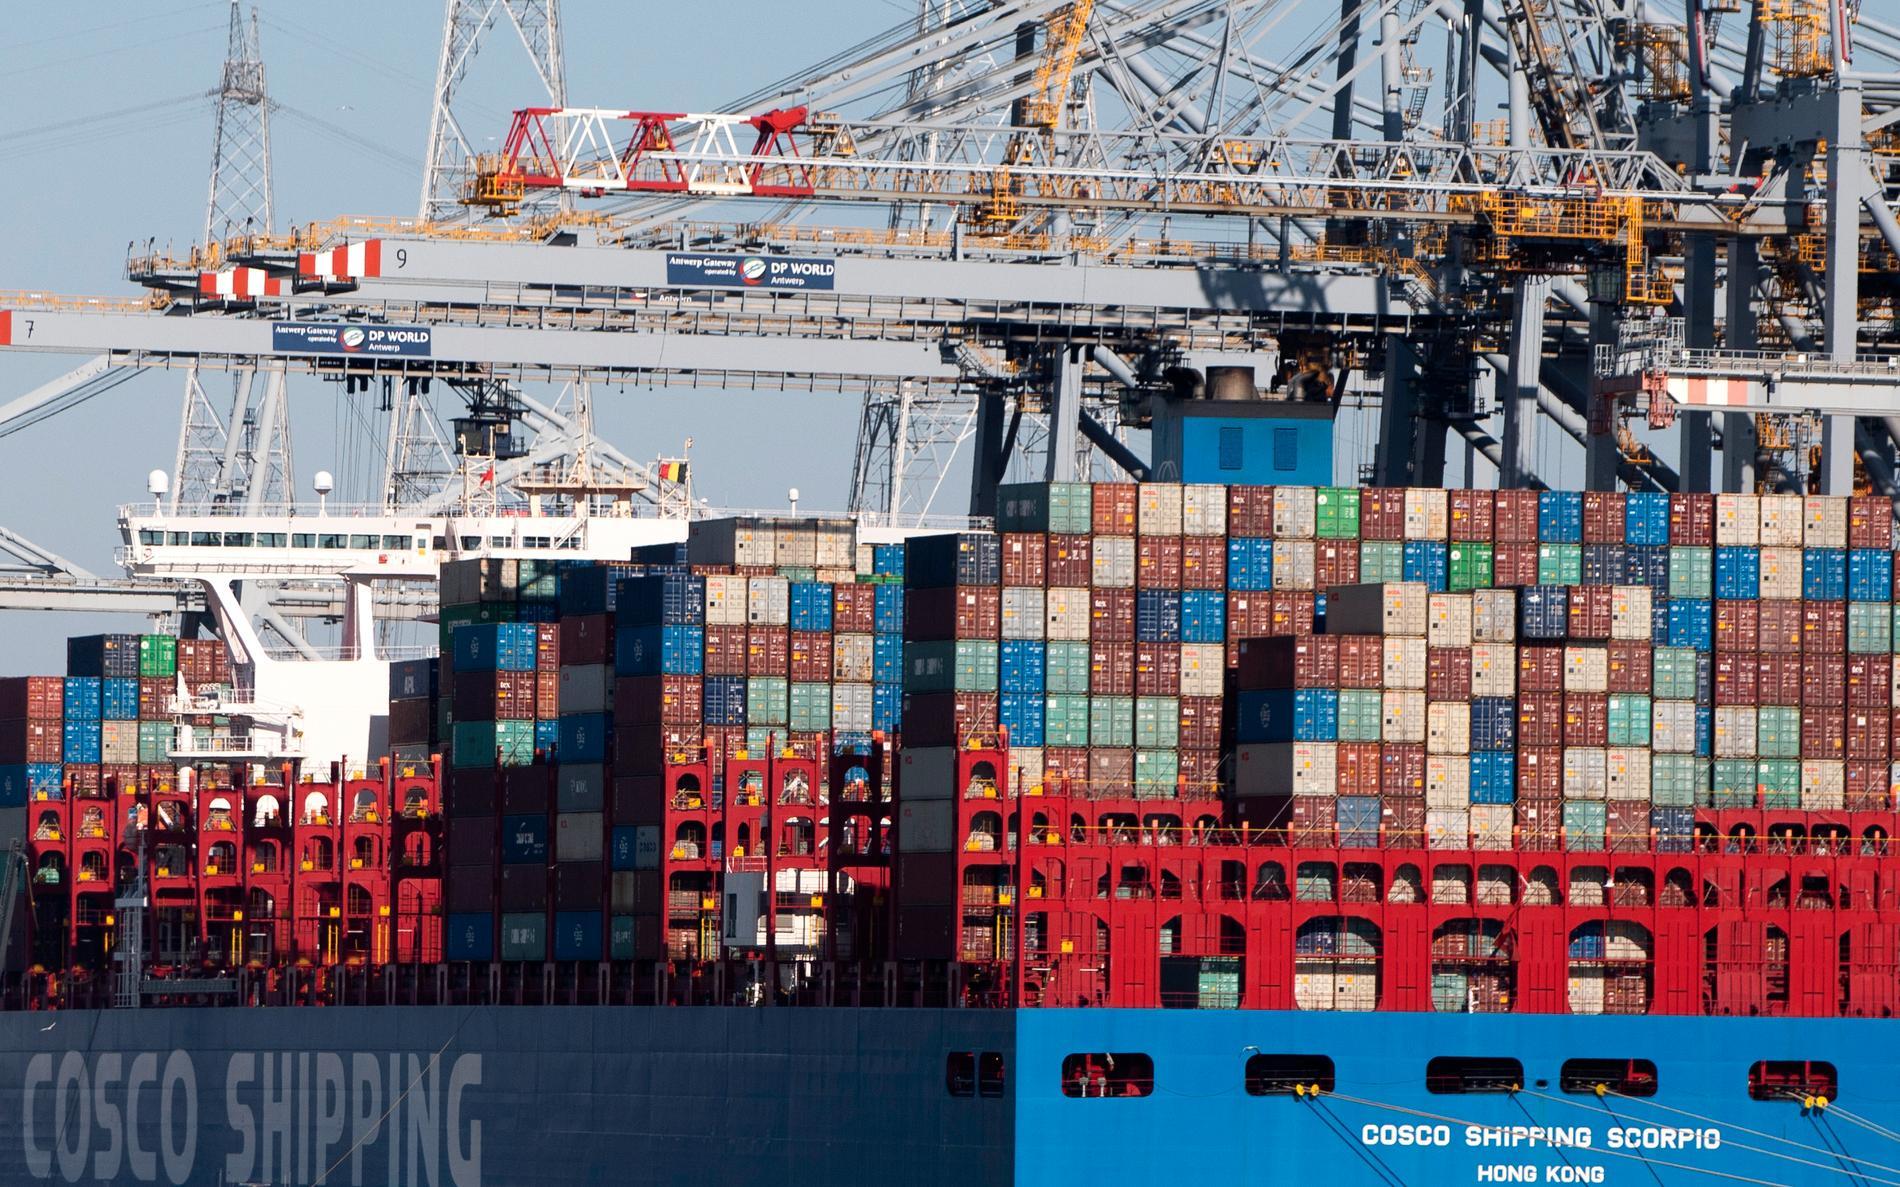 Containerfartyg i Antwerpen i Belgien. Fartygsbesättningar kommer nu erbjudas vaccinering. Arkivbild